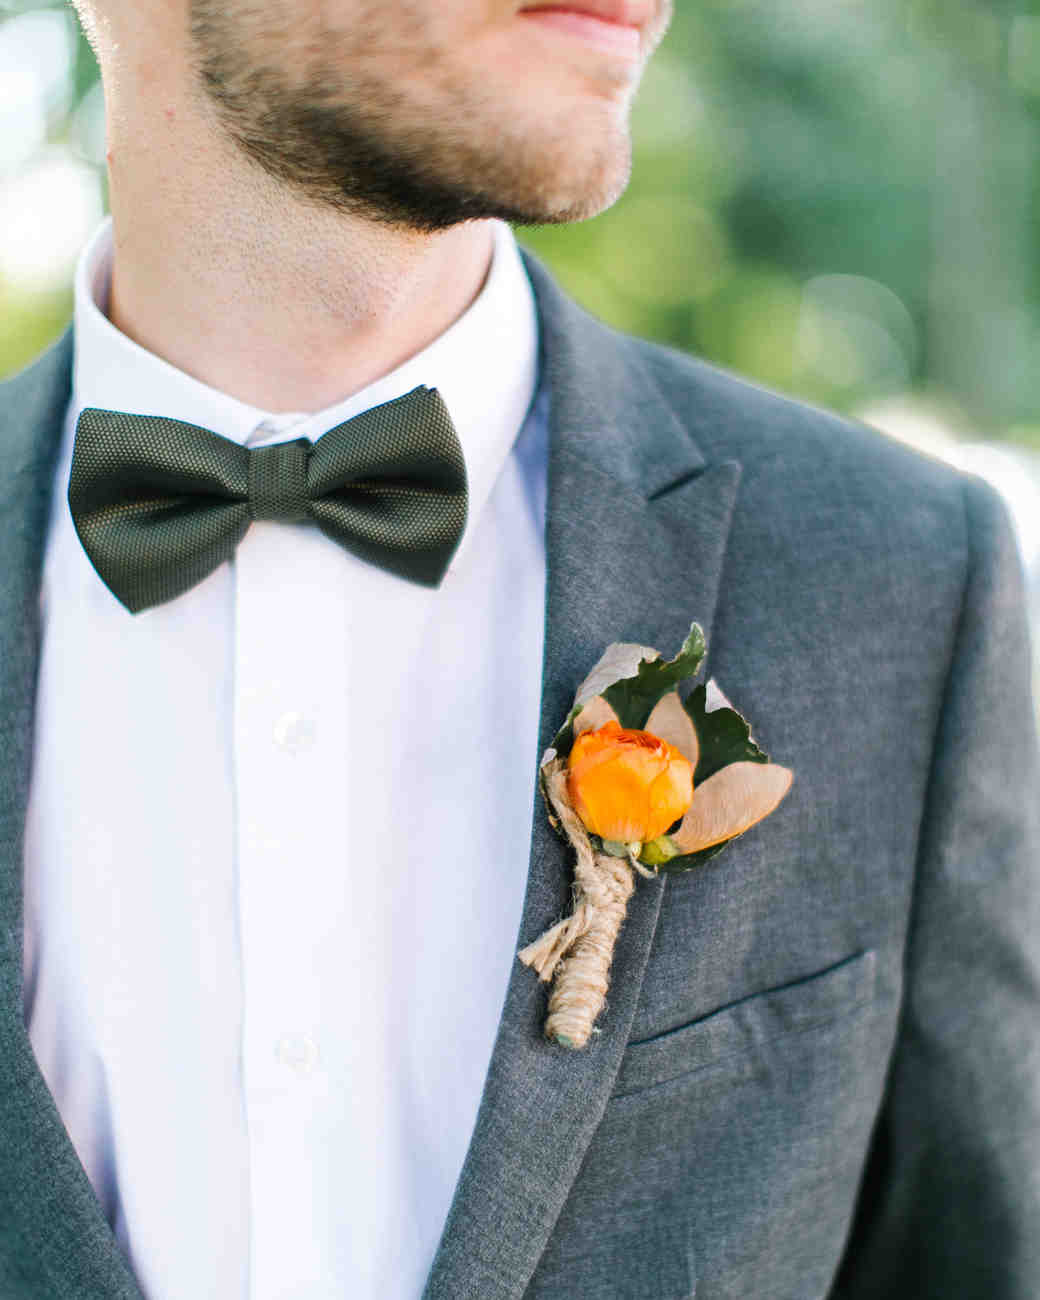 marguerita-aaron-wedding-boutonniere-160-s111848-0214.jpg